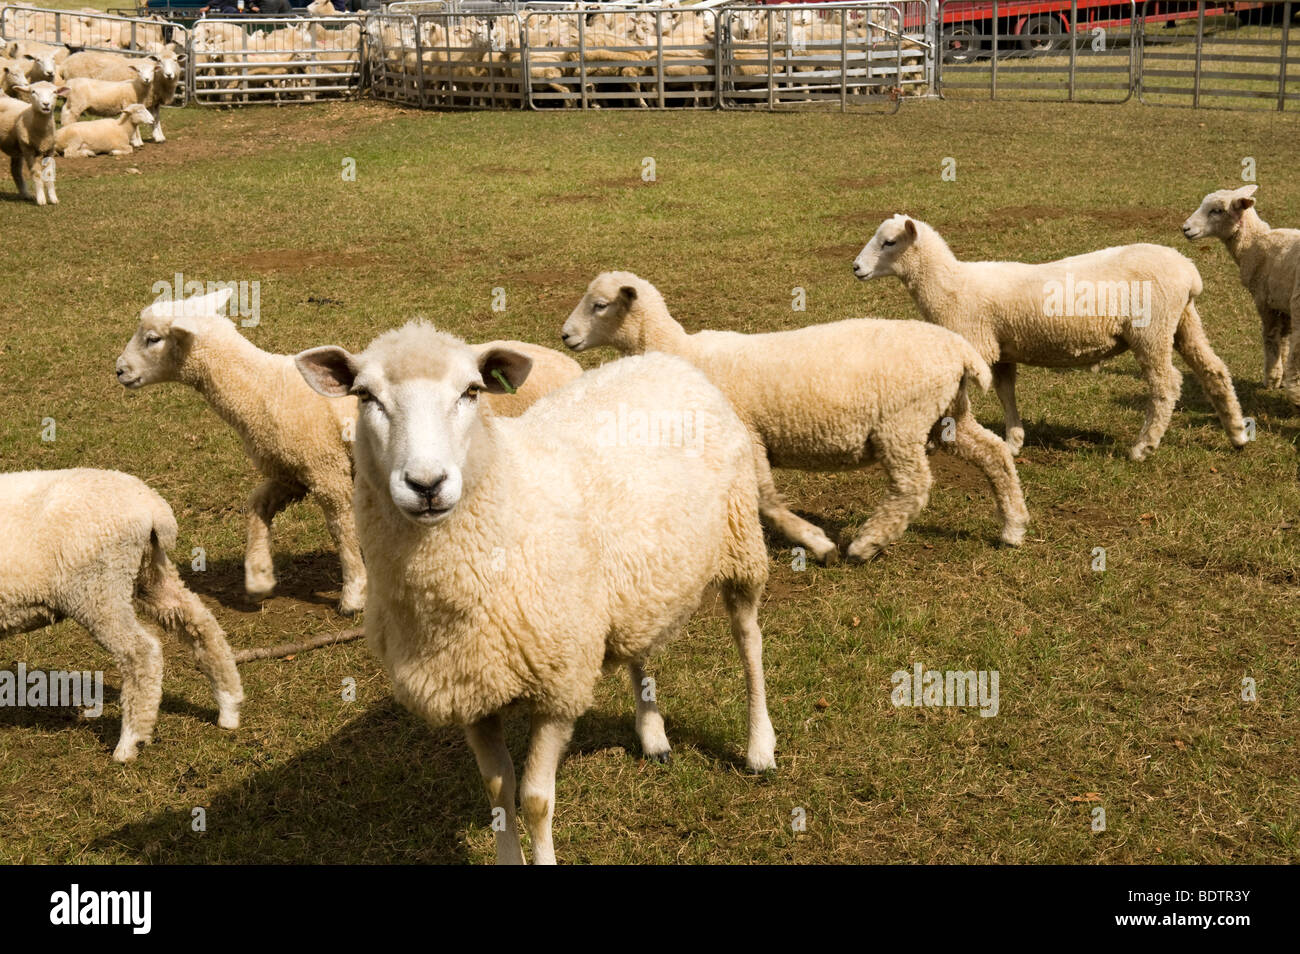 Sheep in pen at Peper Harow - Stock Image